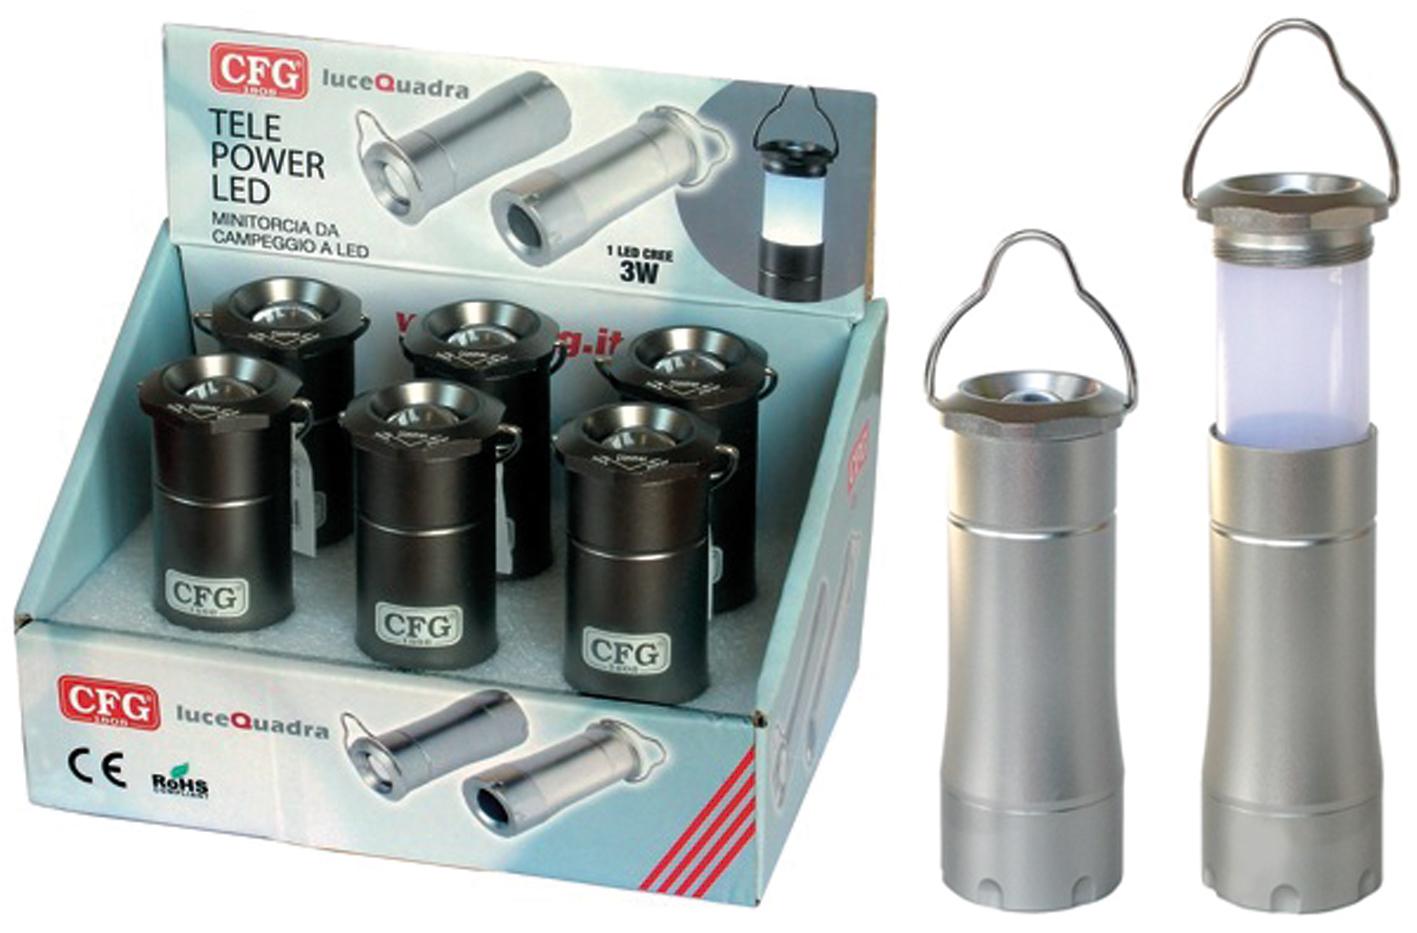 TORCIA TELE POWER LED 3W ARG